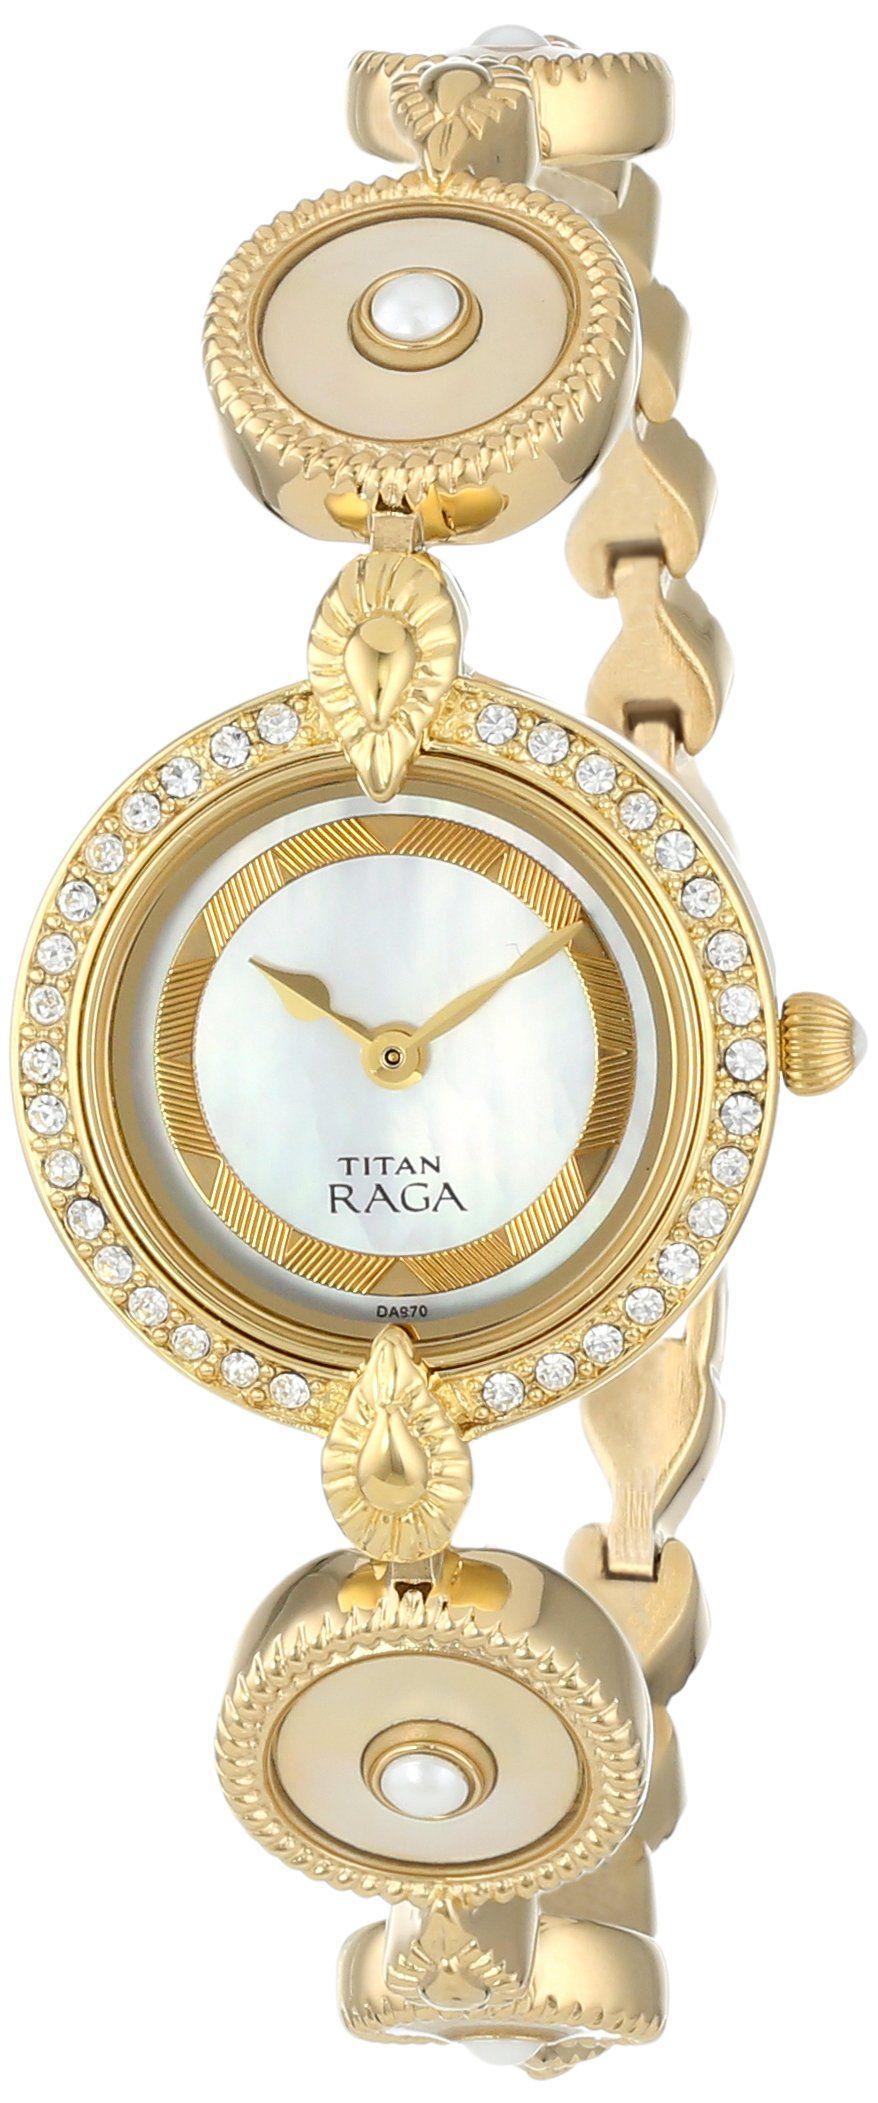 10ee1d11787 Titan Women s 9903YM02 Theme Raga Intricate Swarovski Elements Jewelry Inspired  Gold-Tone Watch